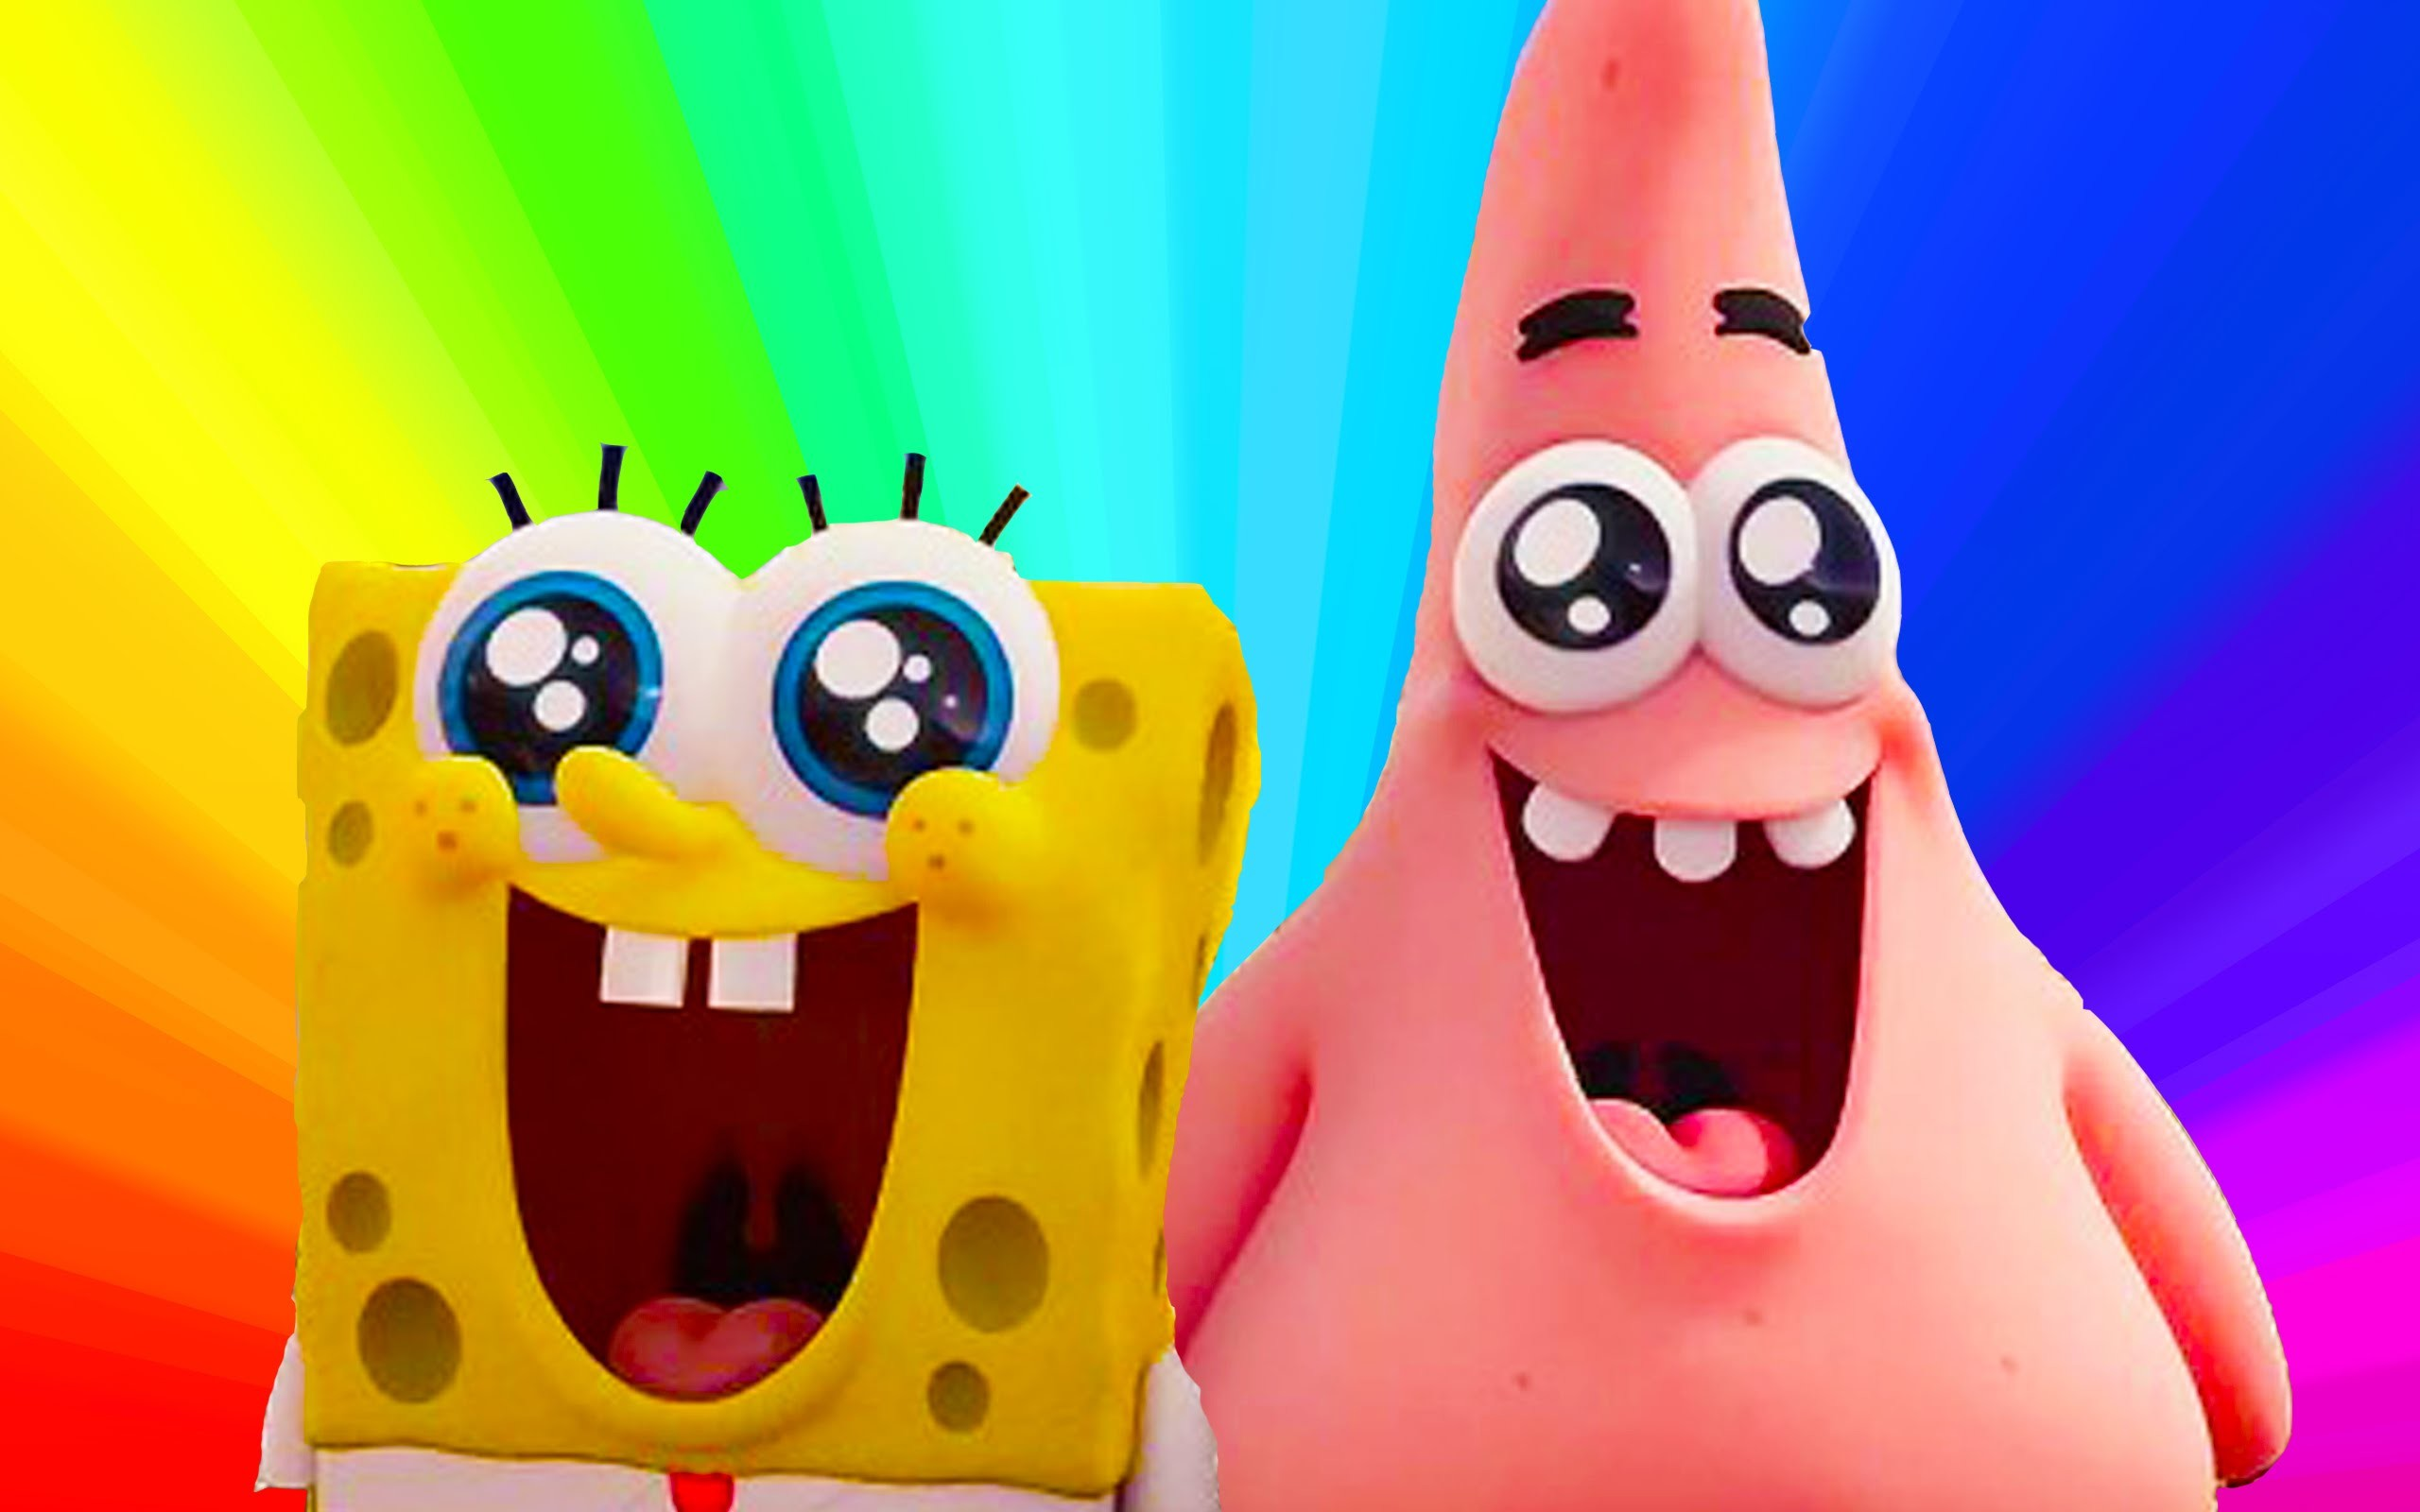 Meet Spongebob & Patrick Star, Easy Play doh creation for kids – YouTube